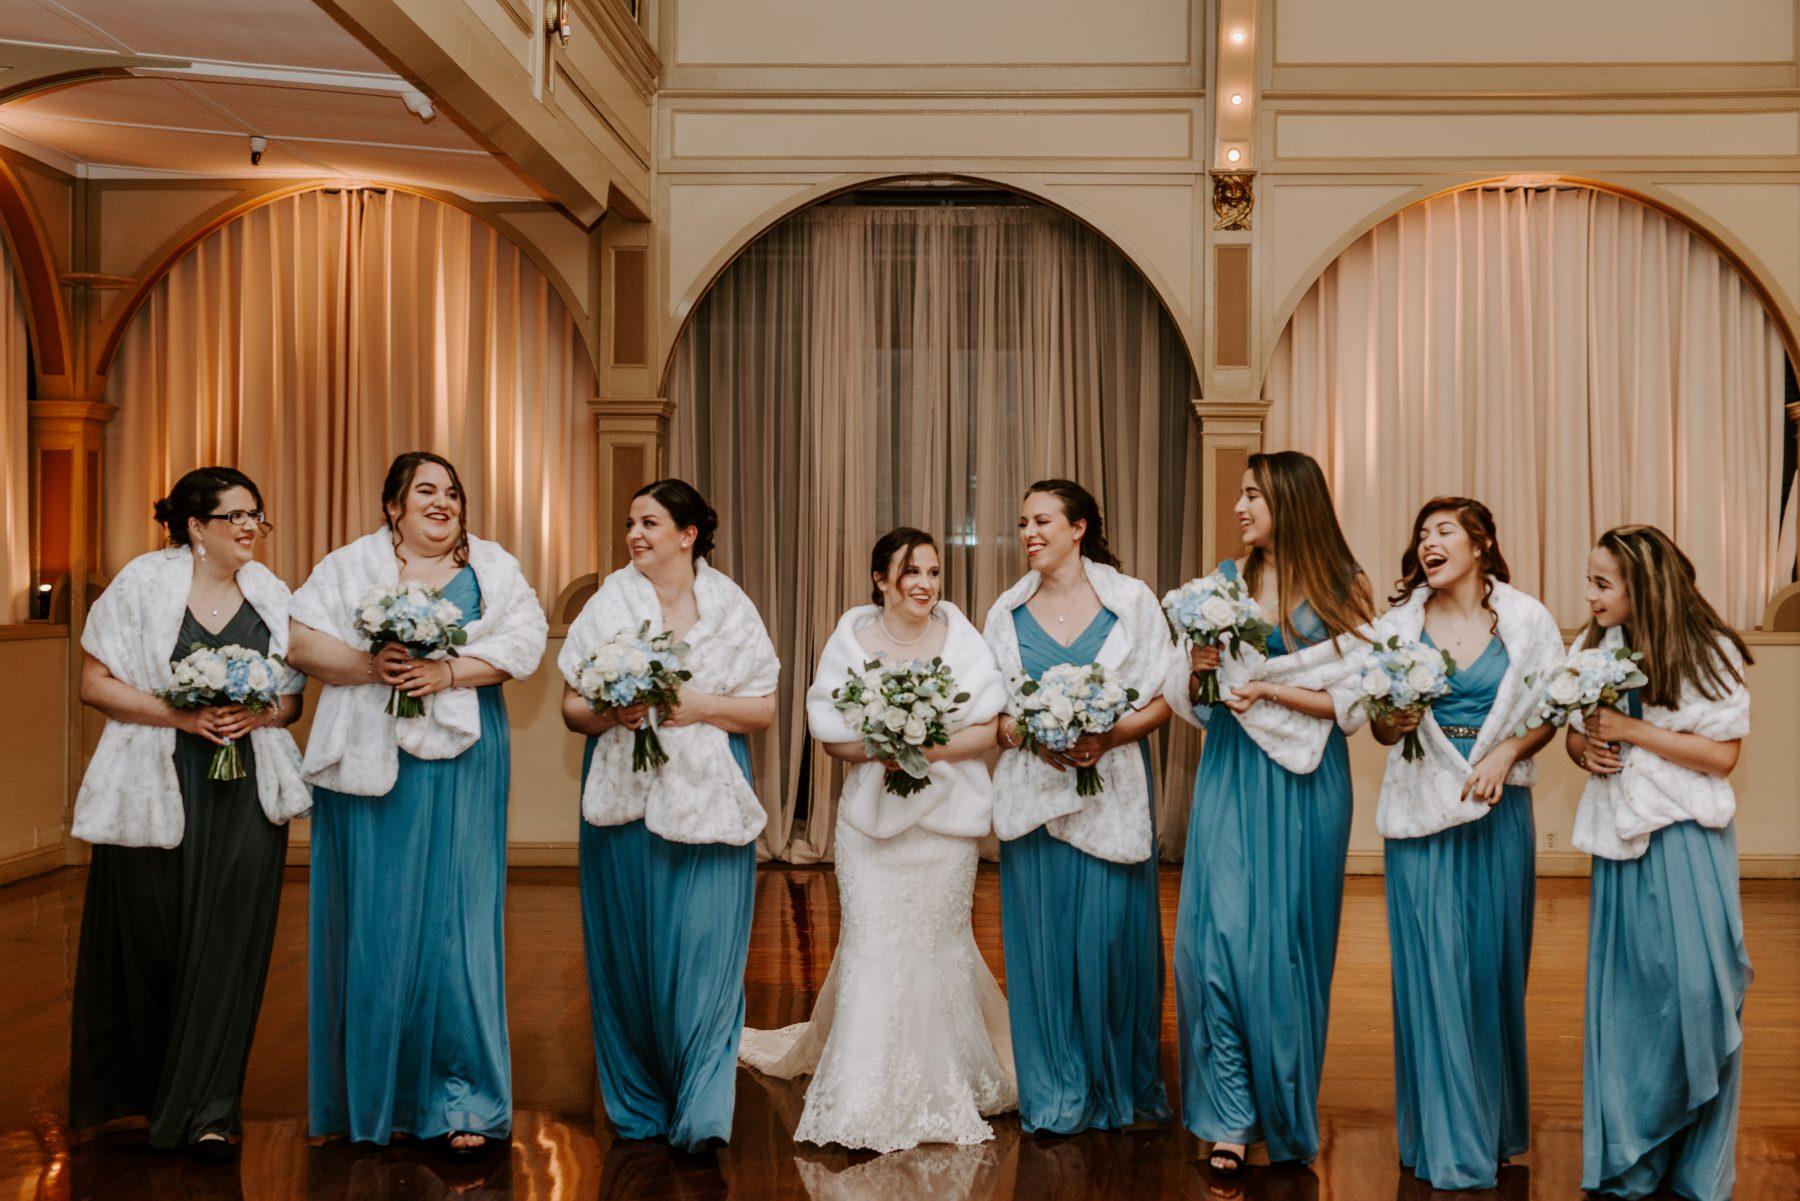 Rhodes on the Pawtuxet Cranston Wedding Ashley and David Blueflash Photography 10